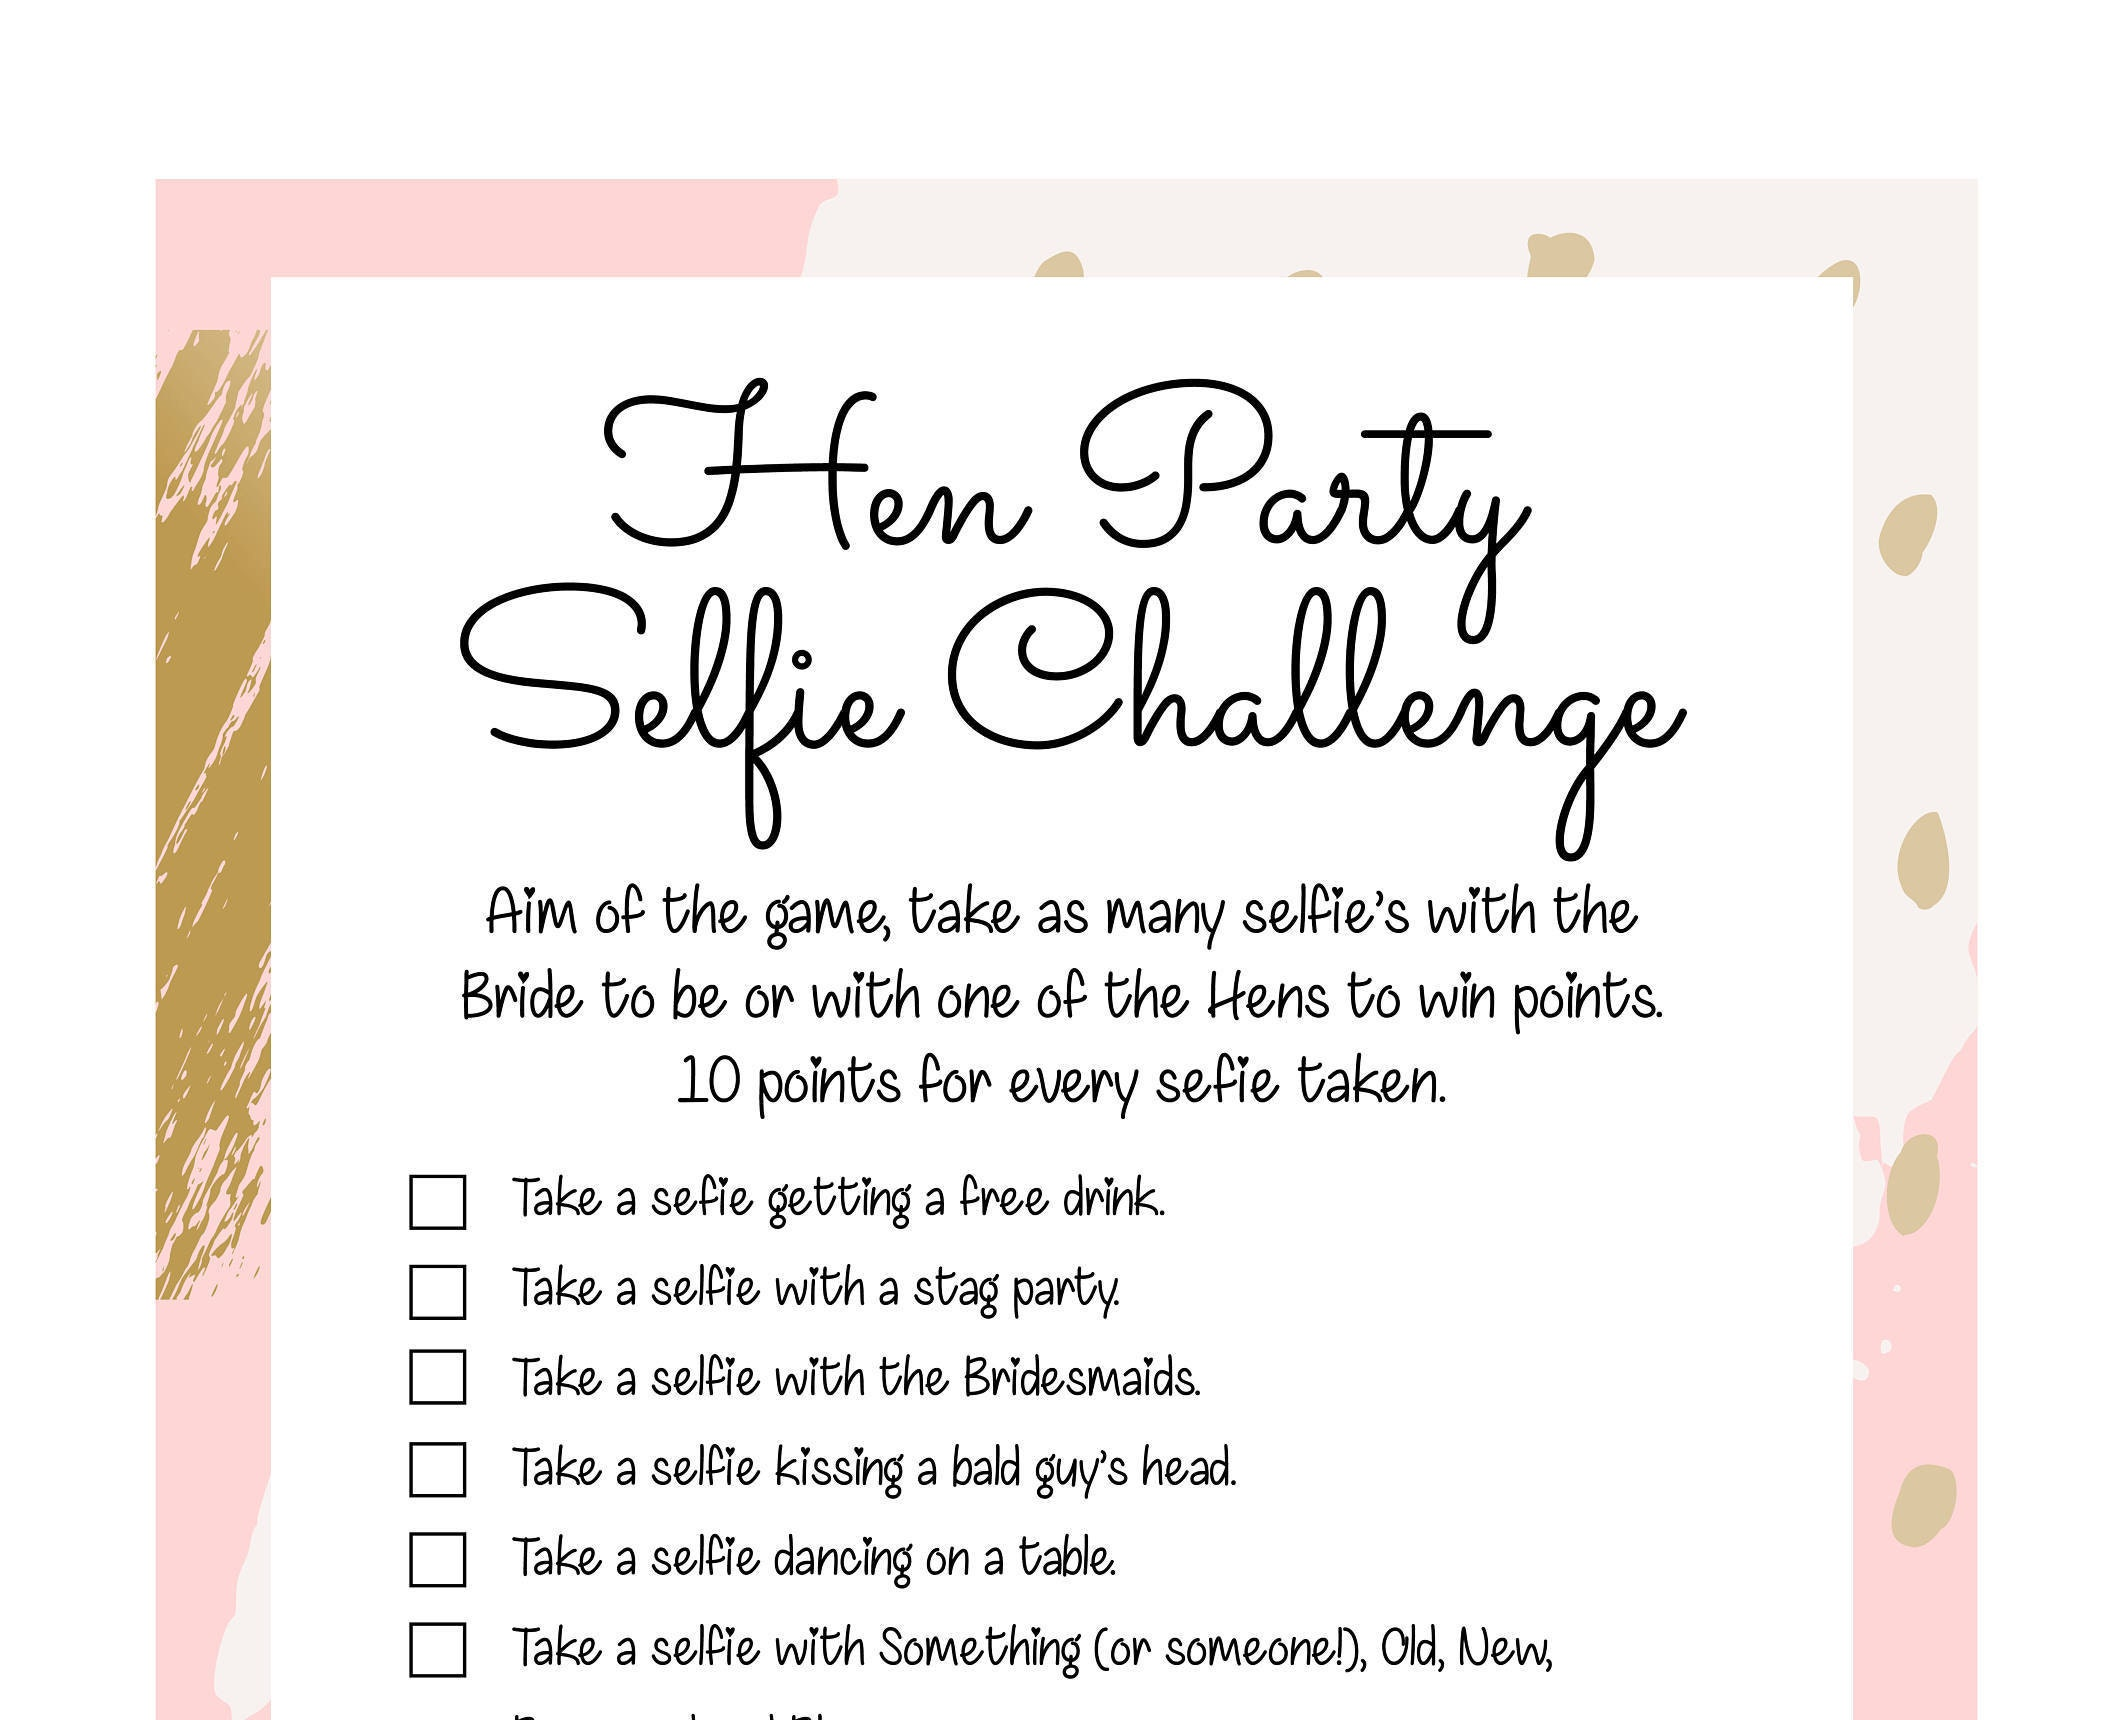 Hen Party games. Hen Party Selfie/Photo challenge. Hen Party | Etsy